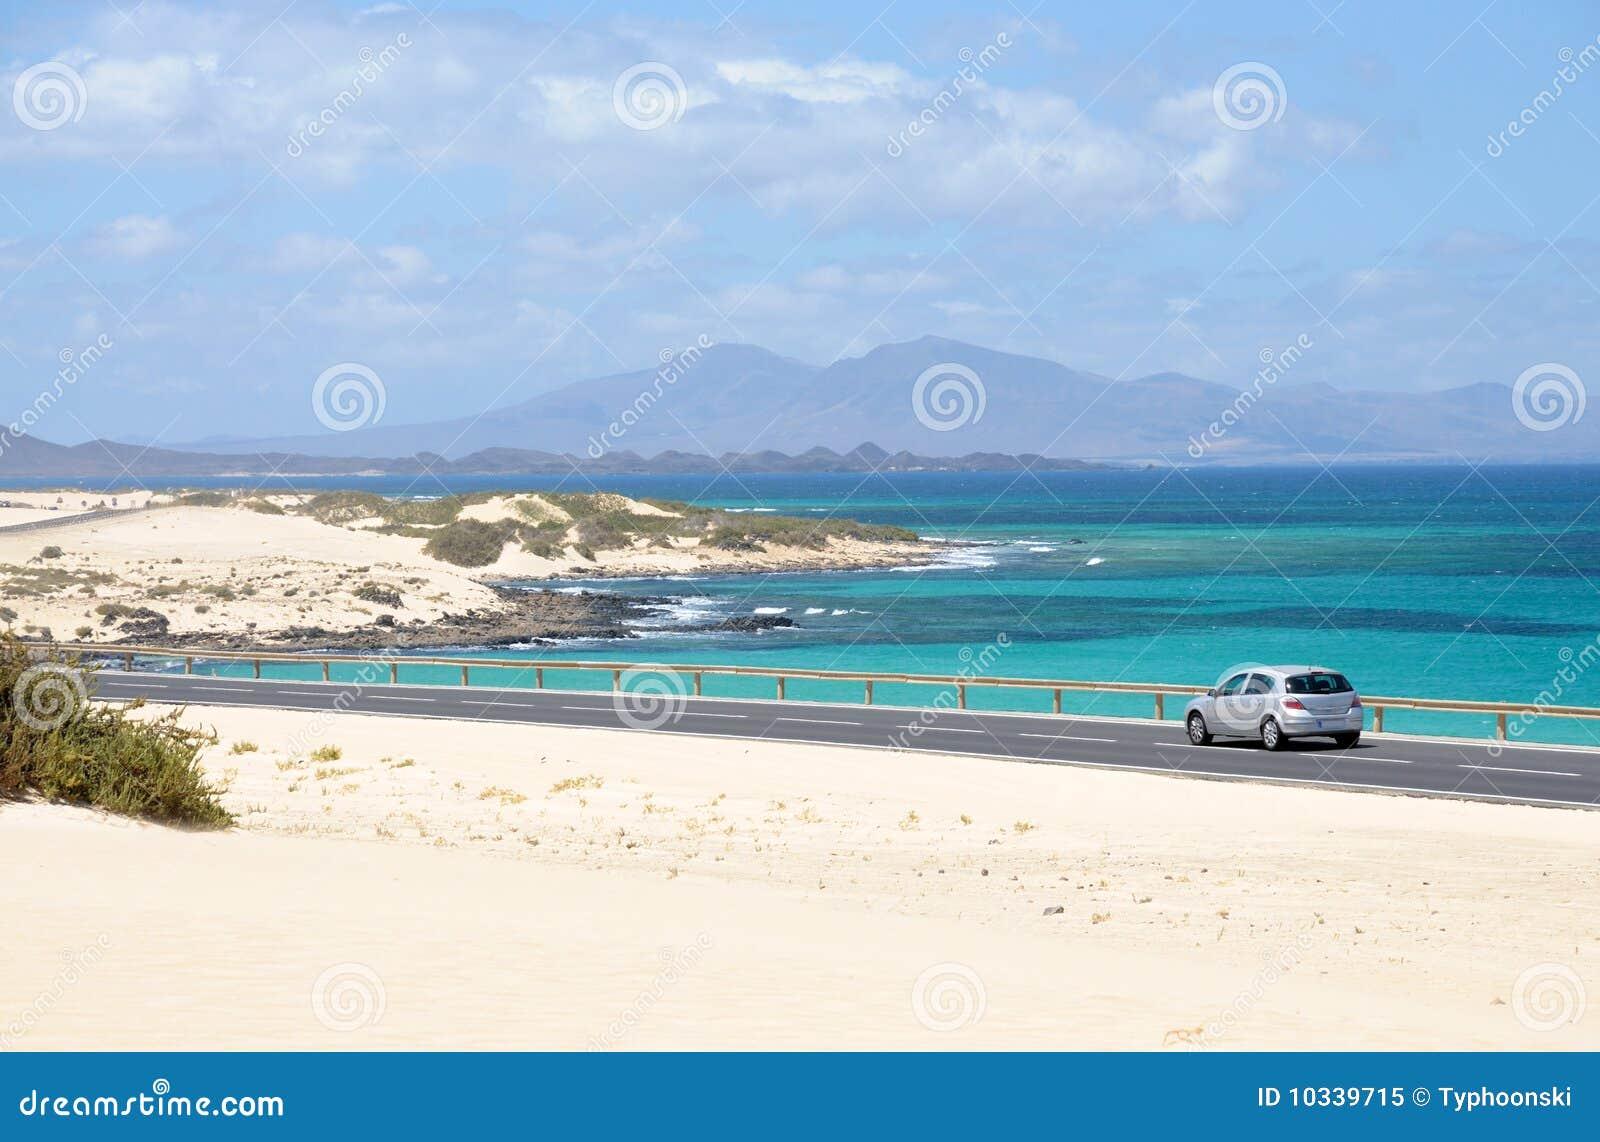 Coast near Corralejo, Fuerteventura, Spain